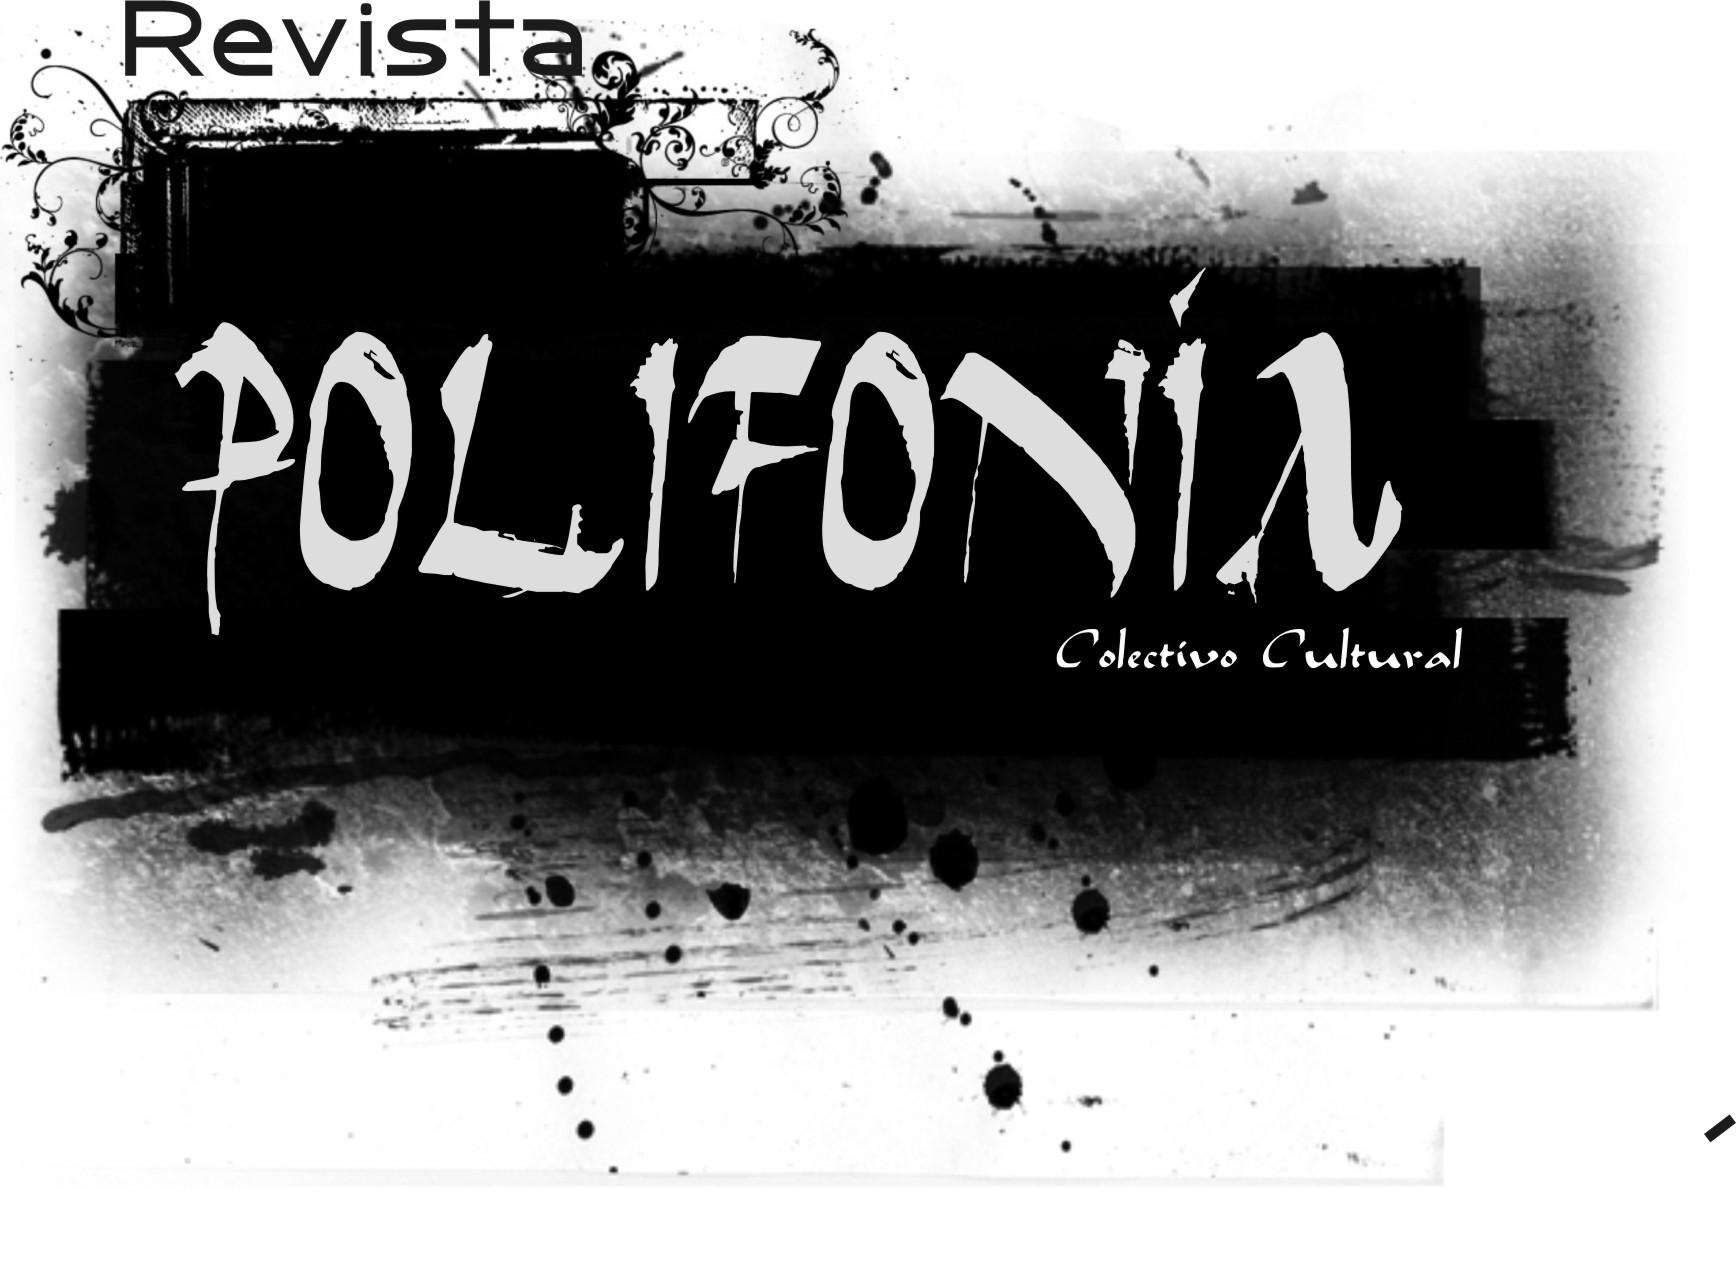 Revista Literaria Polifonía